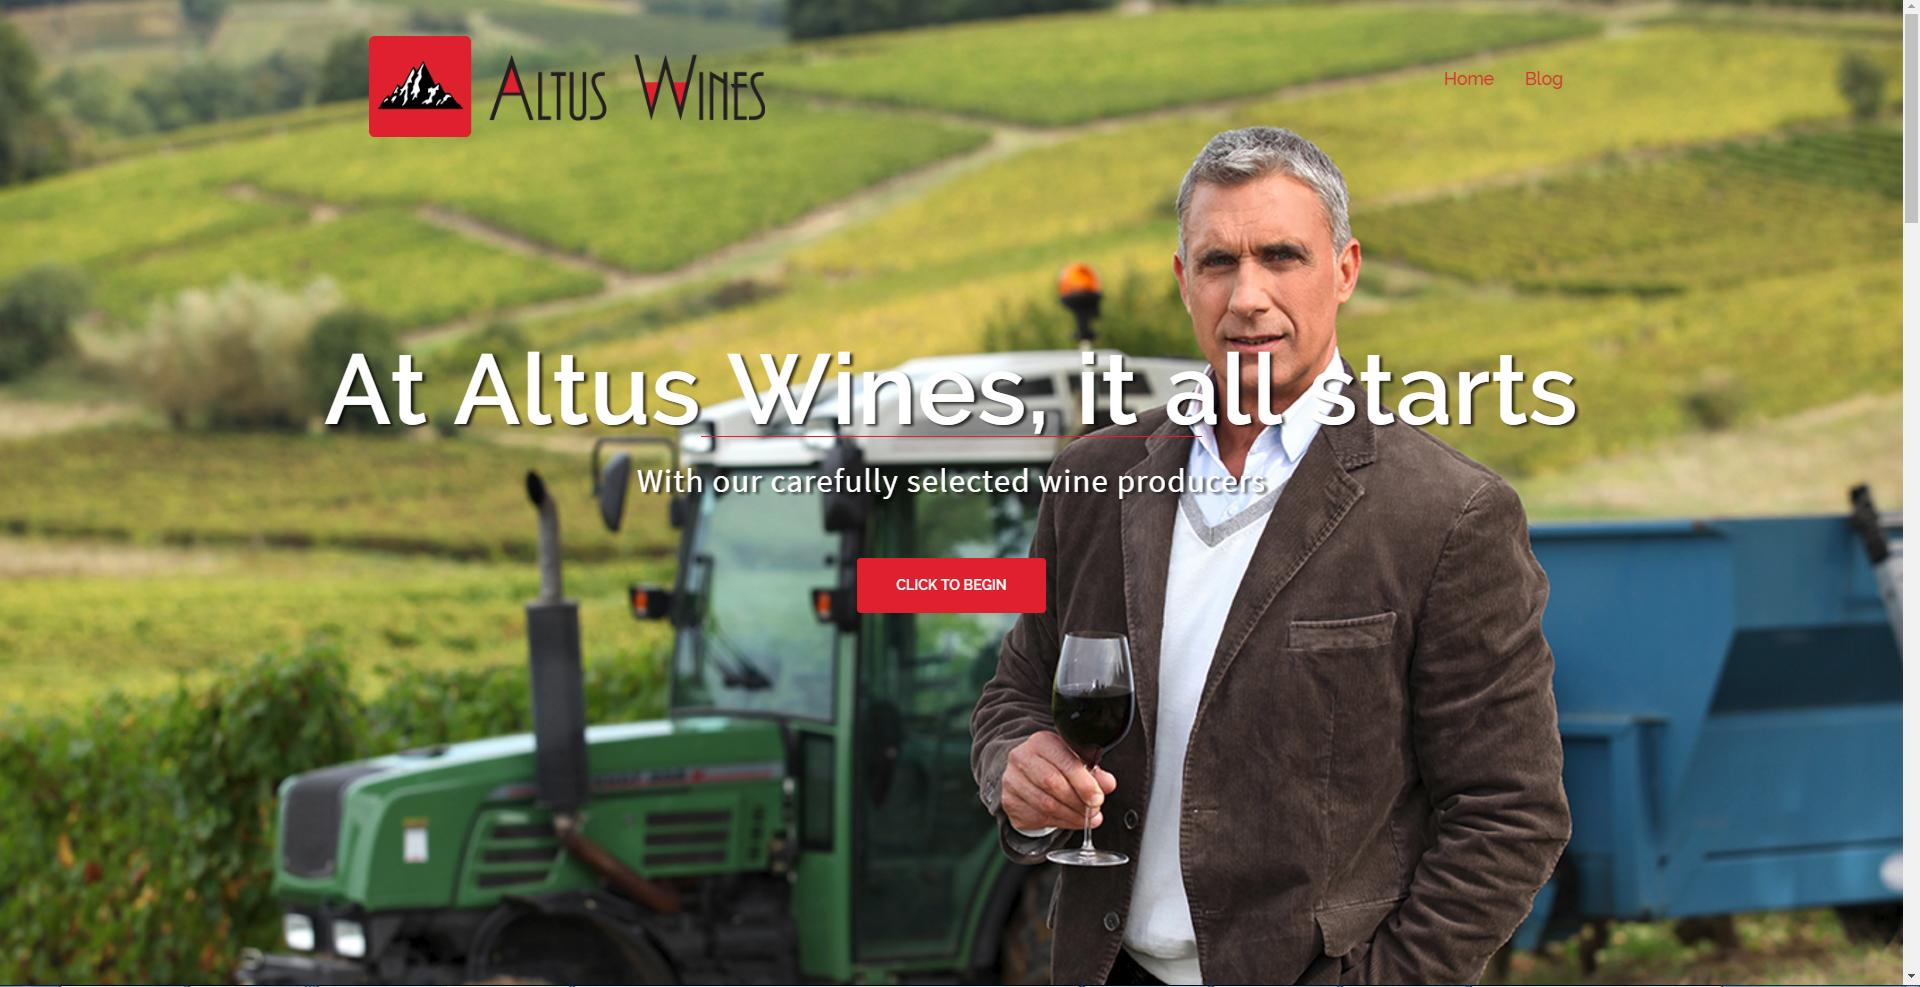 ALTUS WINES WEBSITE DESIGN + INTEGRATION